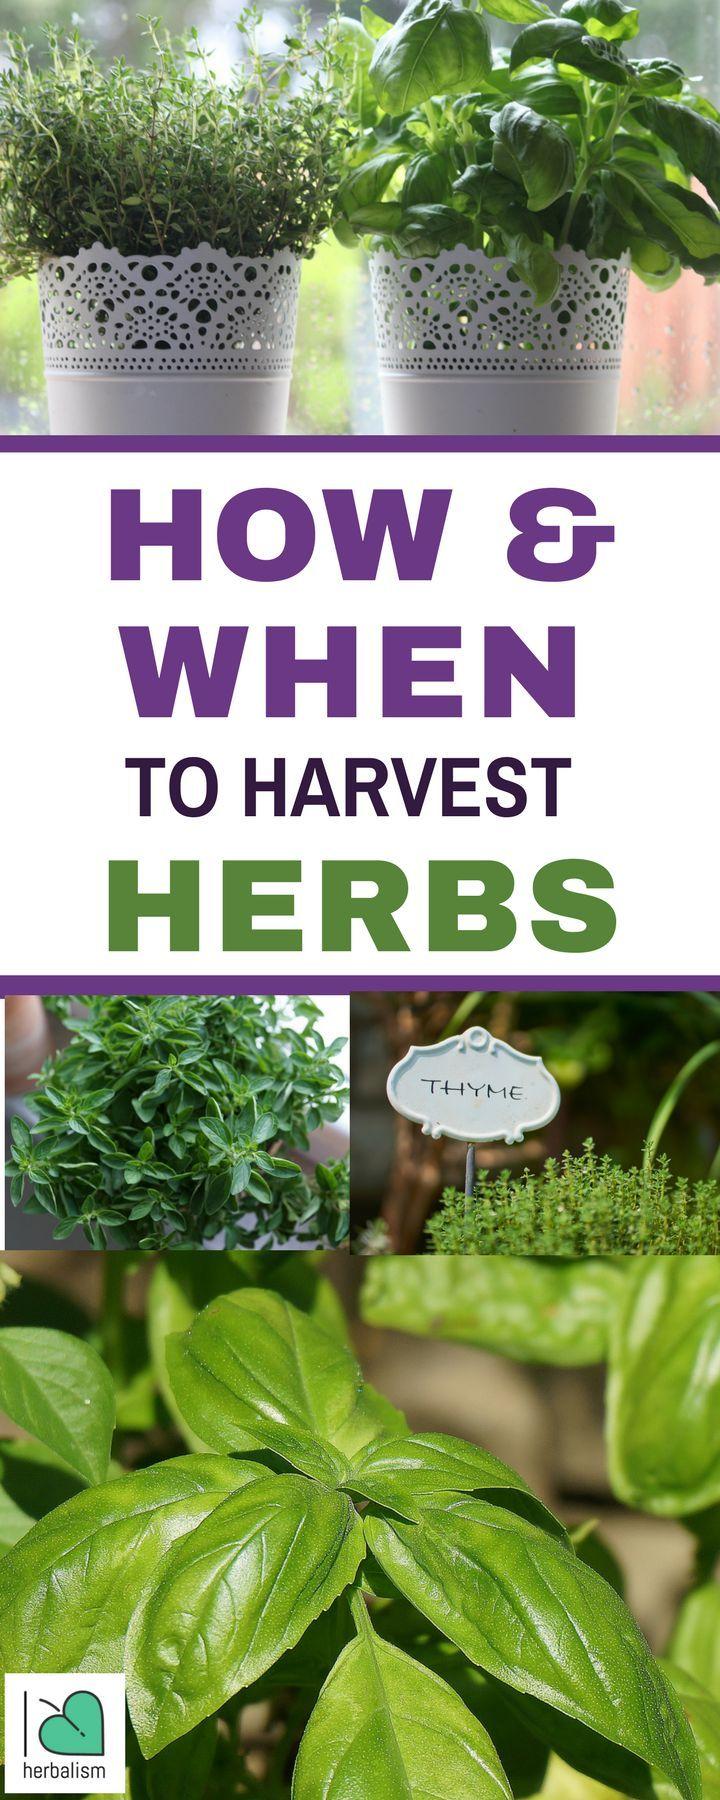 13 Clever And Handy Vegetable Gardening Hacks Harvesting Herbs